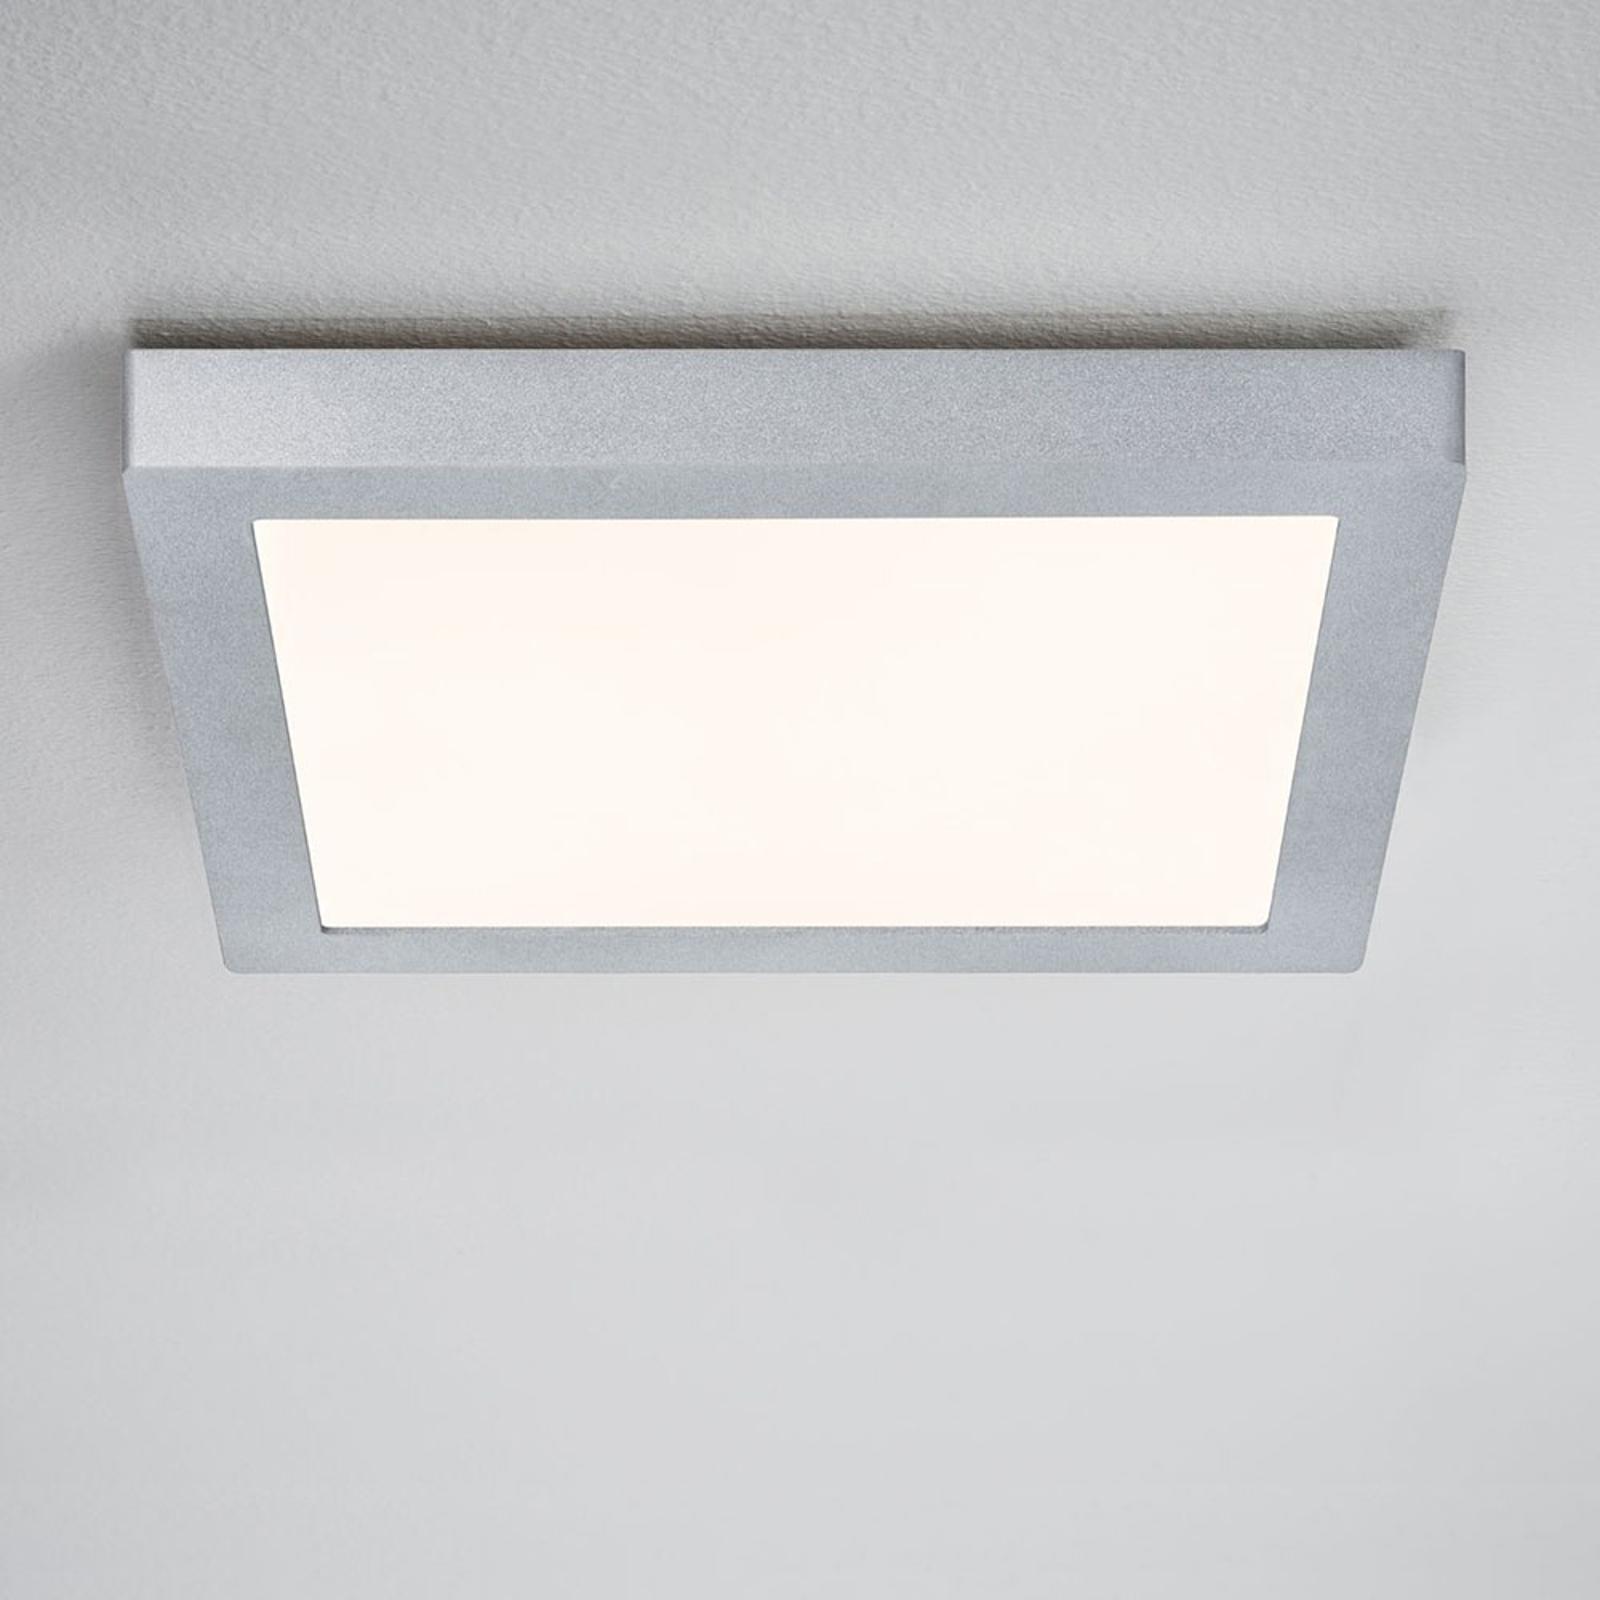 Paulmann Lunar LED-Panel, eckig, chrom, 30x30cm